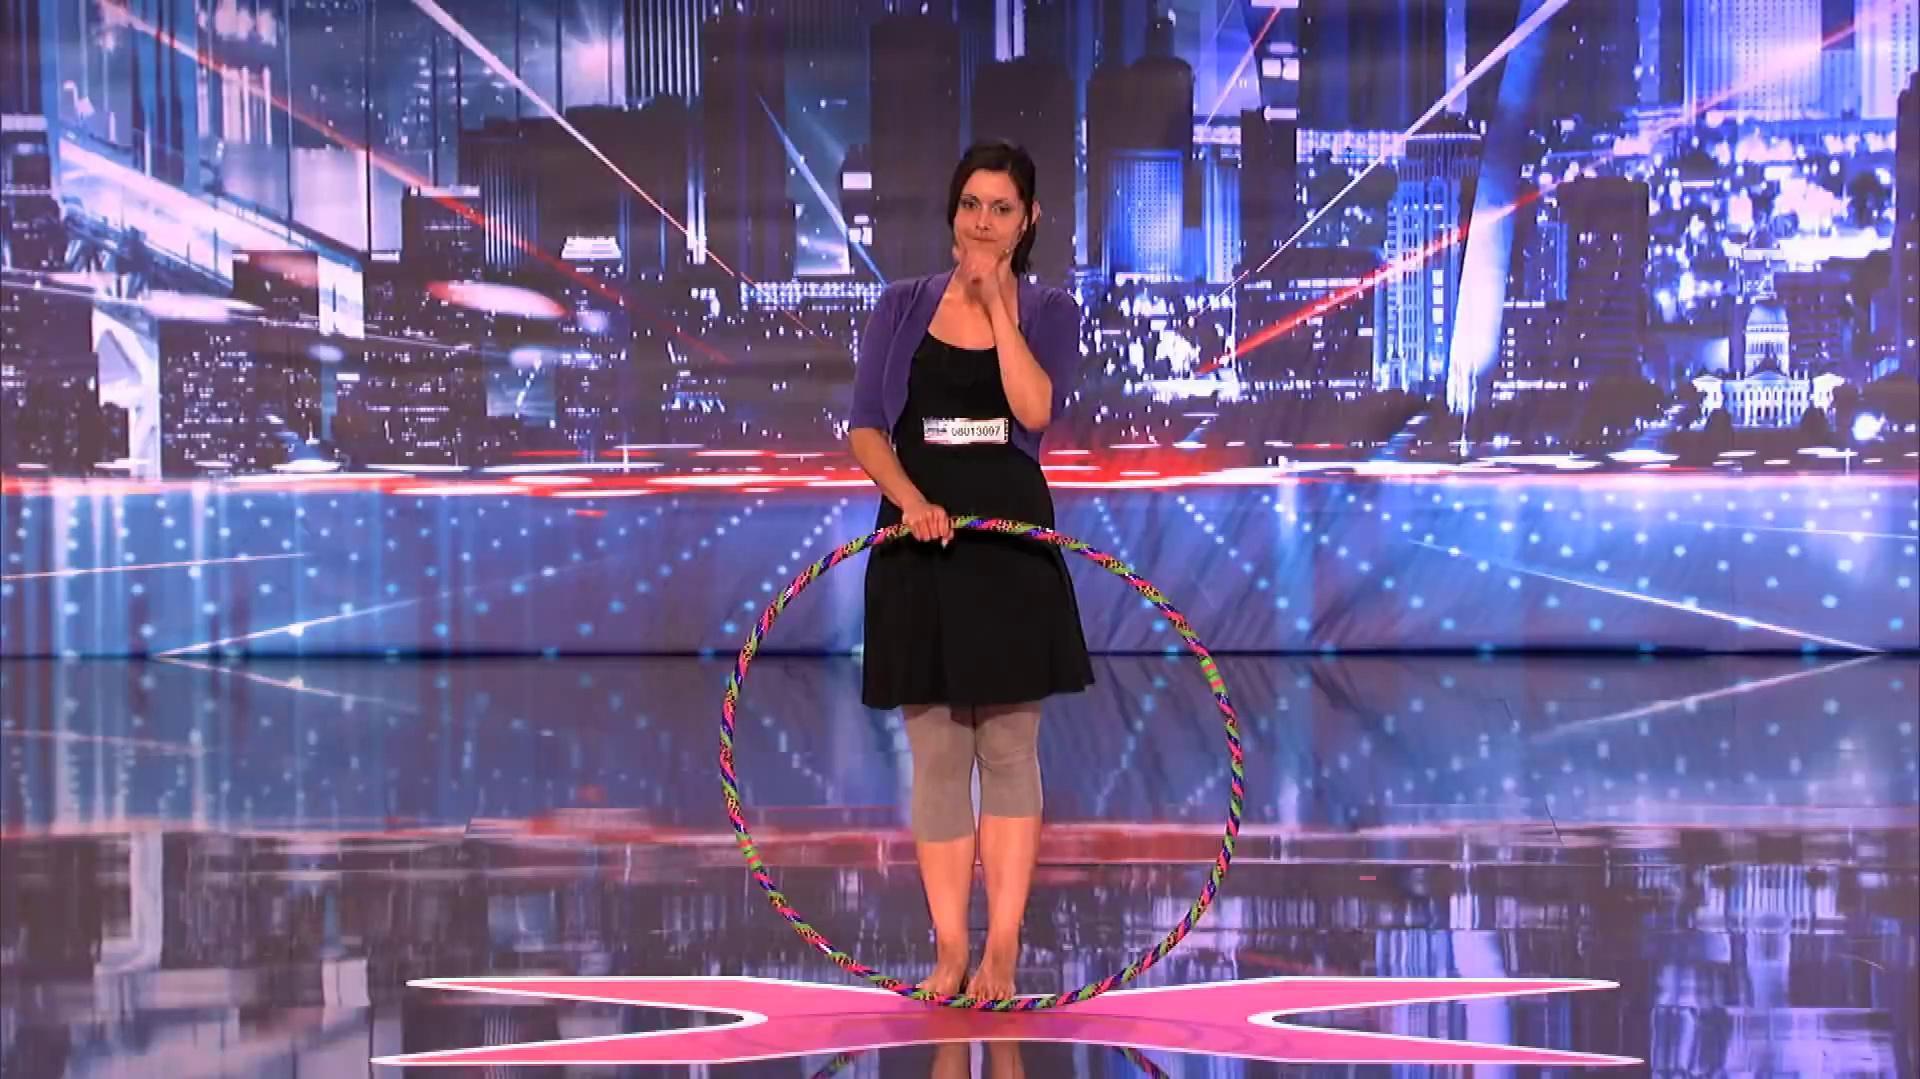 America's_Got_Talent_2013_-_Season_8_-_089_-_Lindsey_the_Hula_Belching_Girl_Burps_as_She_Hula_Hoops